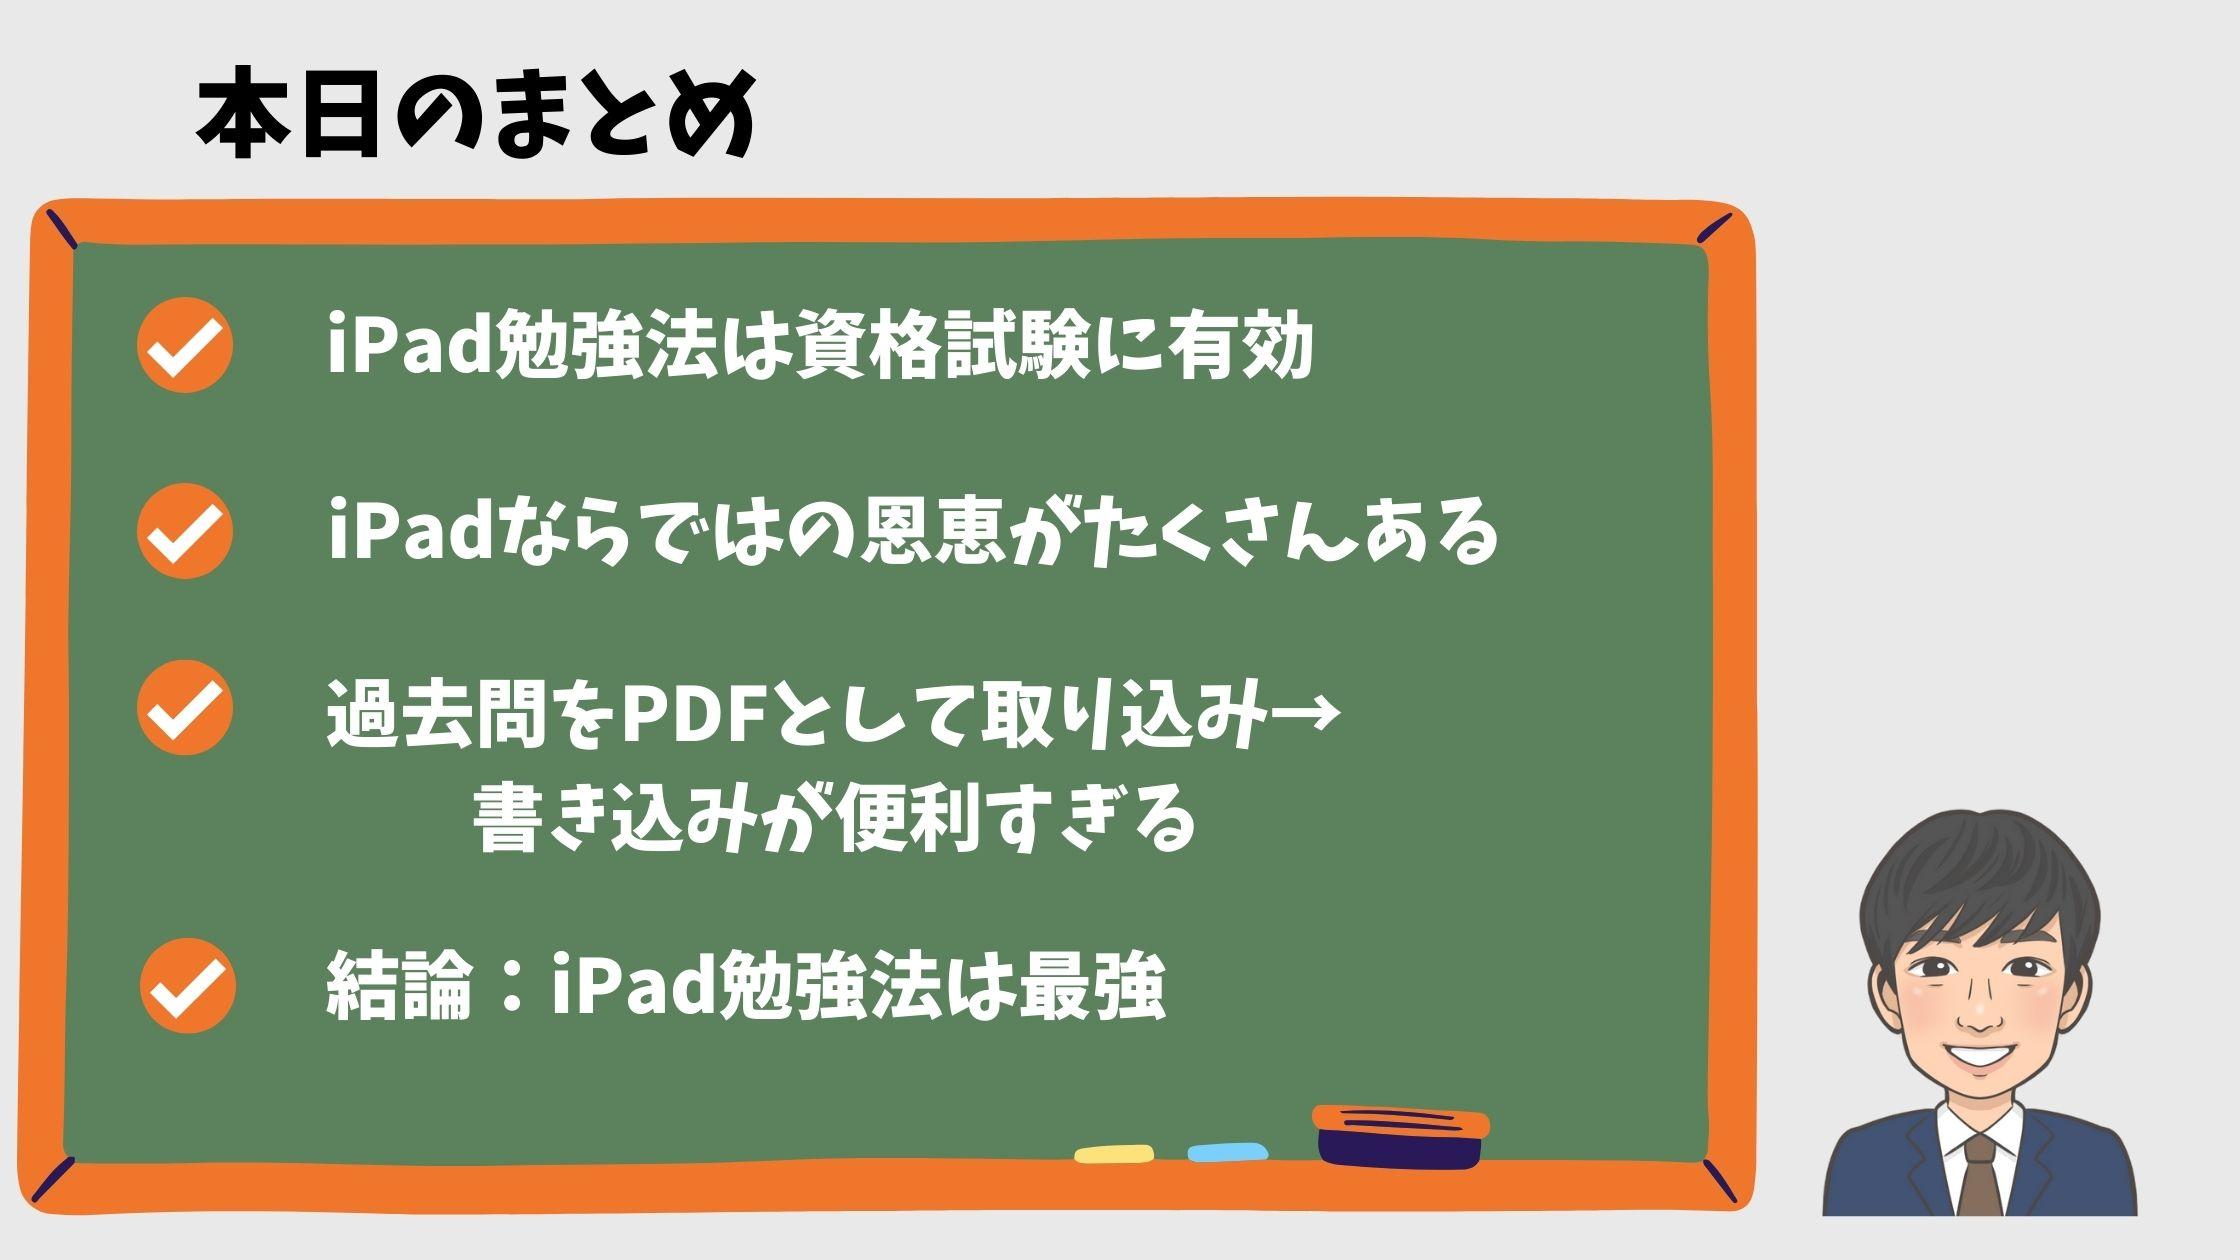 iPadでの資格勉強のまとめ